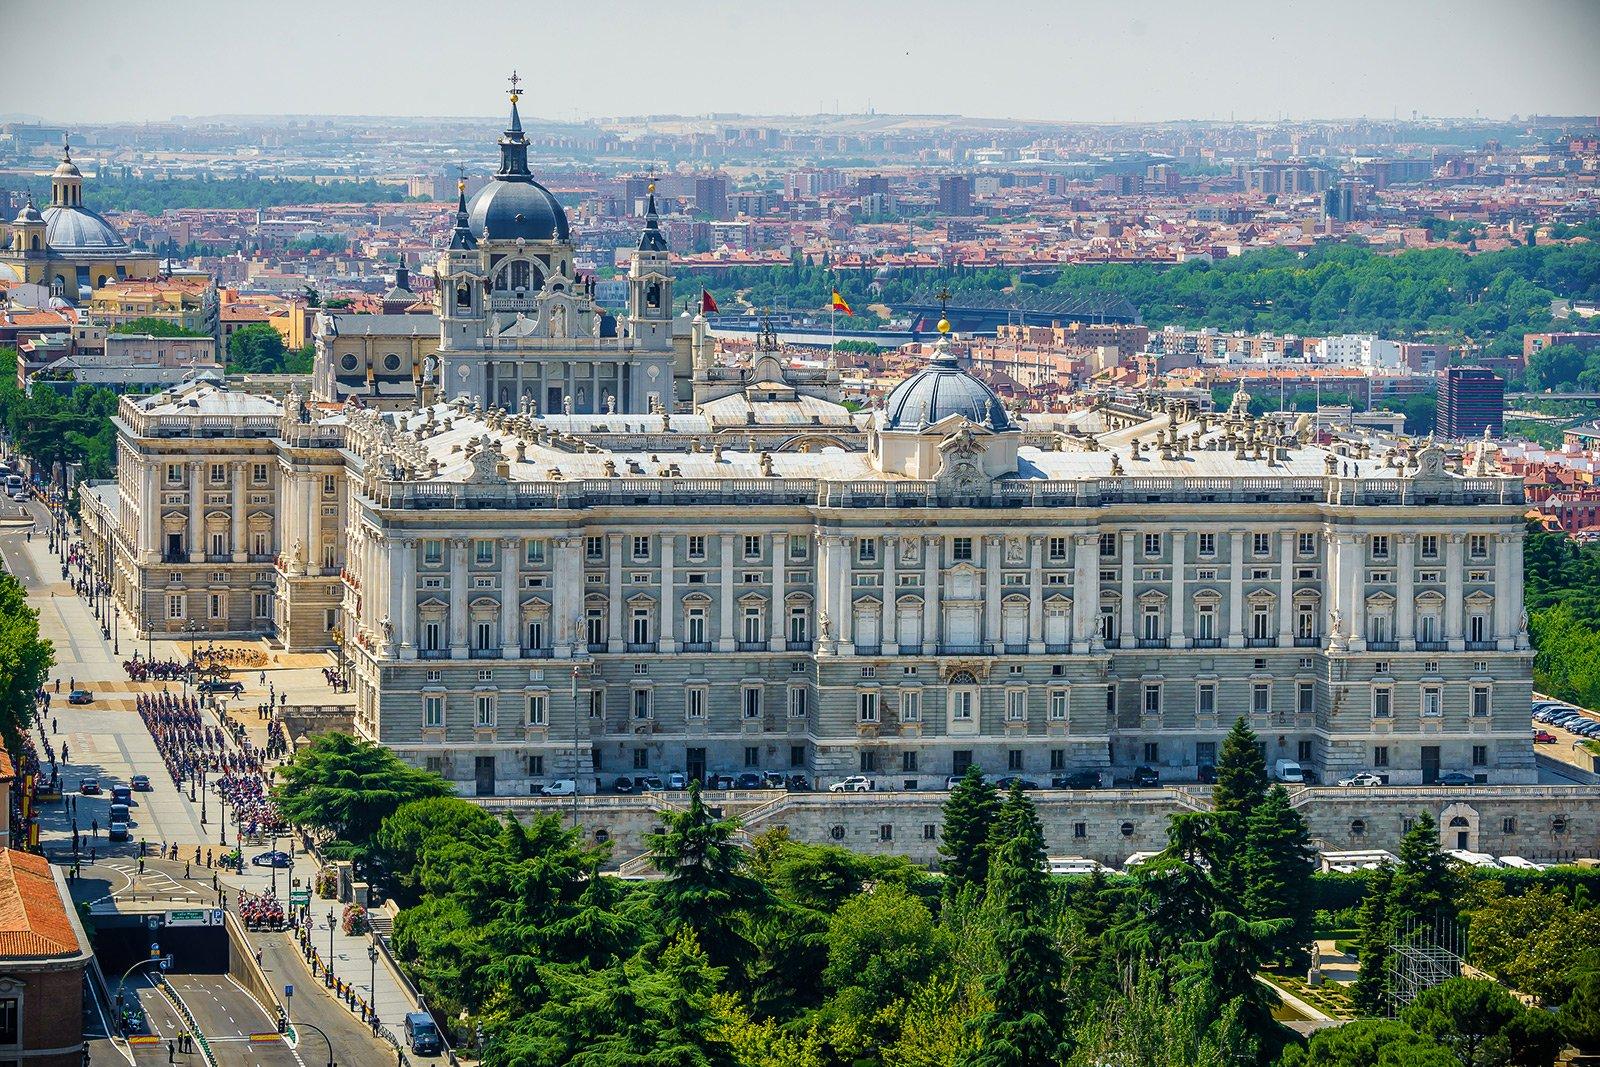 Royal Palace of Madrid, Madrid